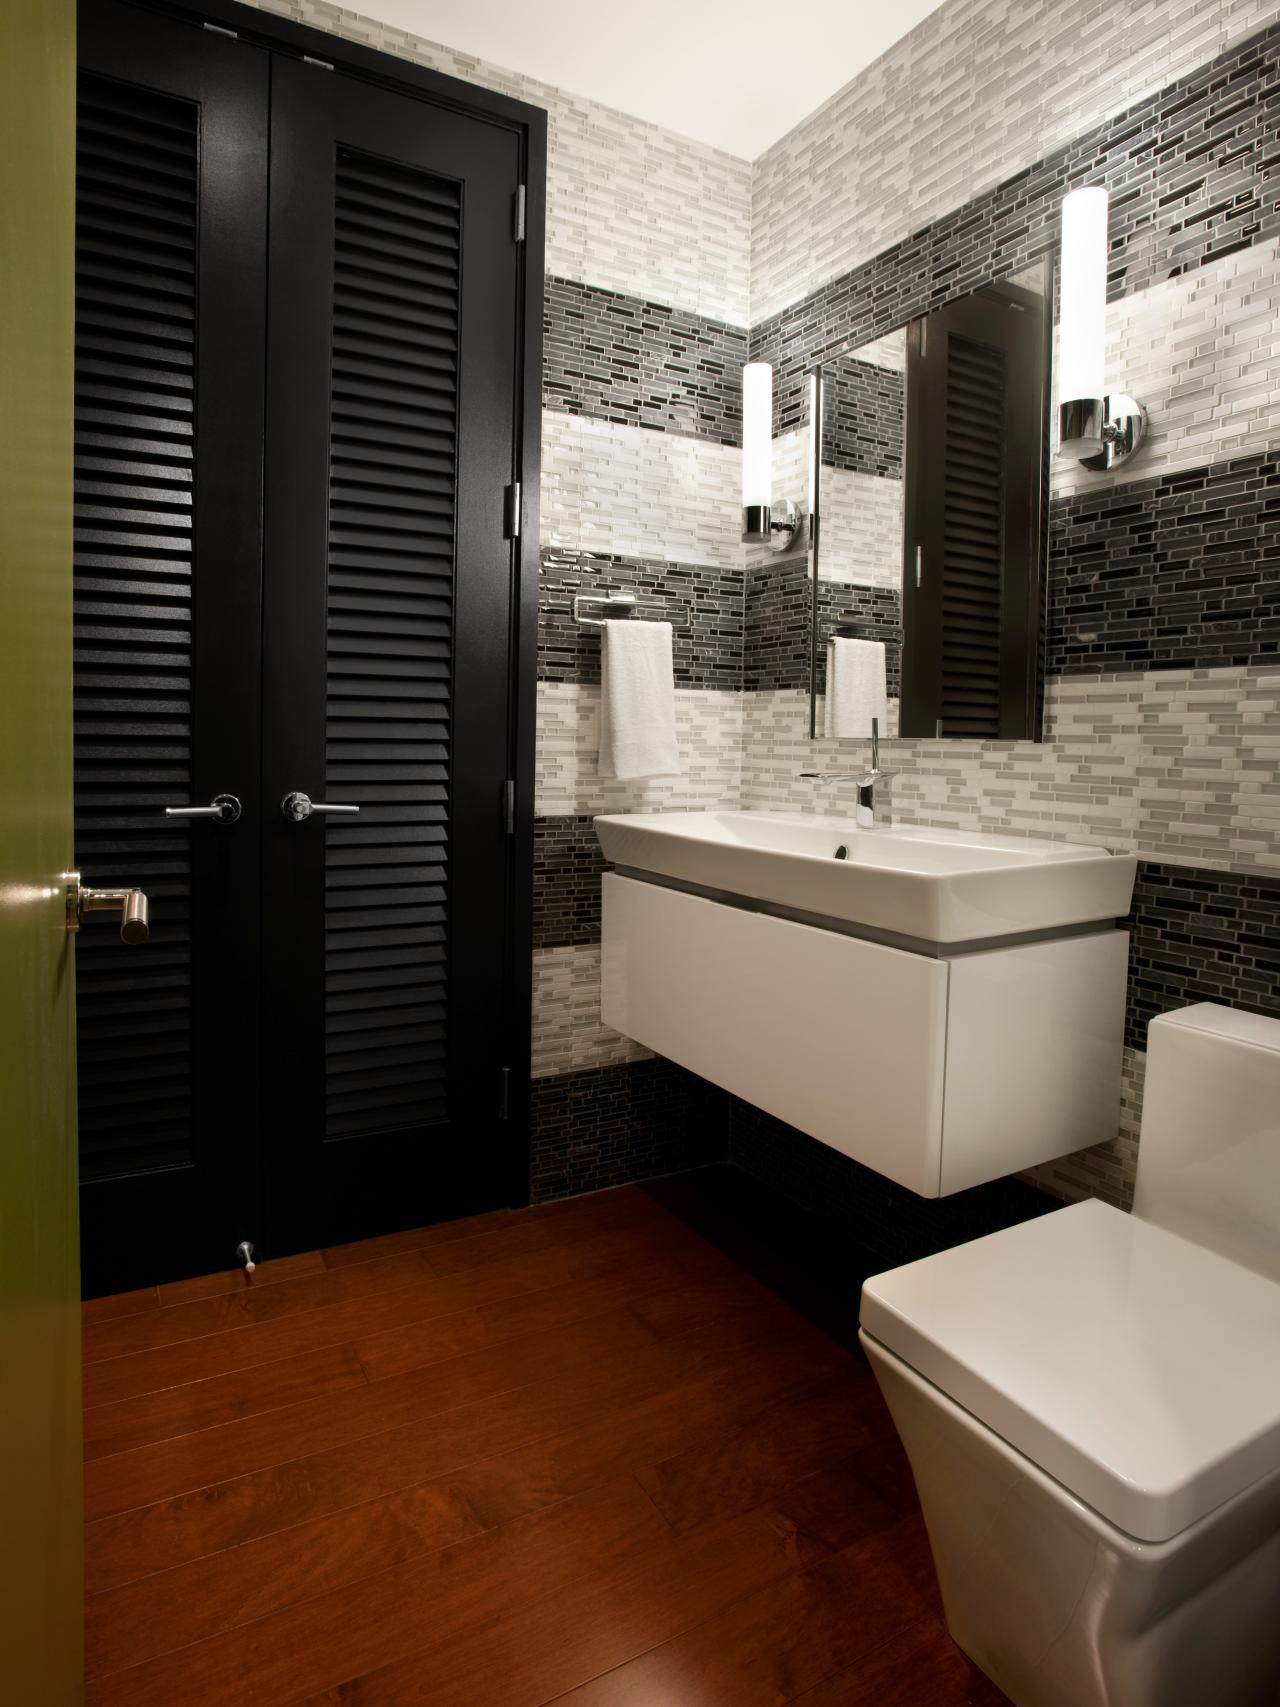 Contemporary Bathroom Design  Top 10 Modern Bathroom Design Ideas 2017 TheyDesign